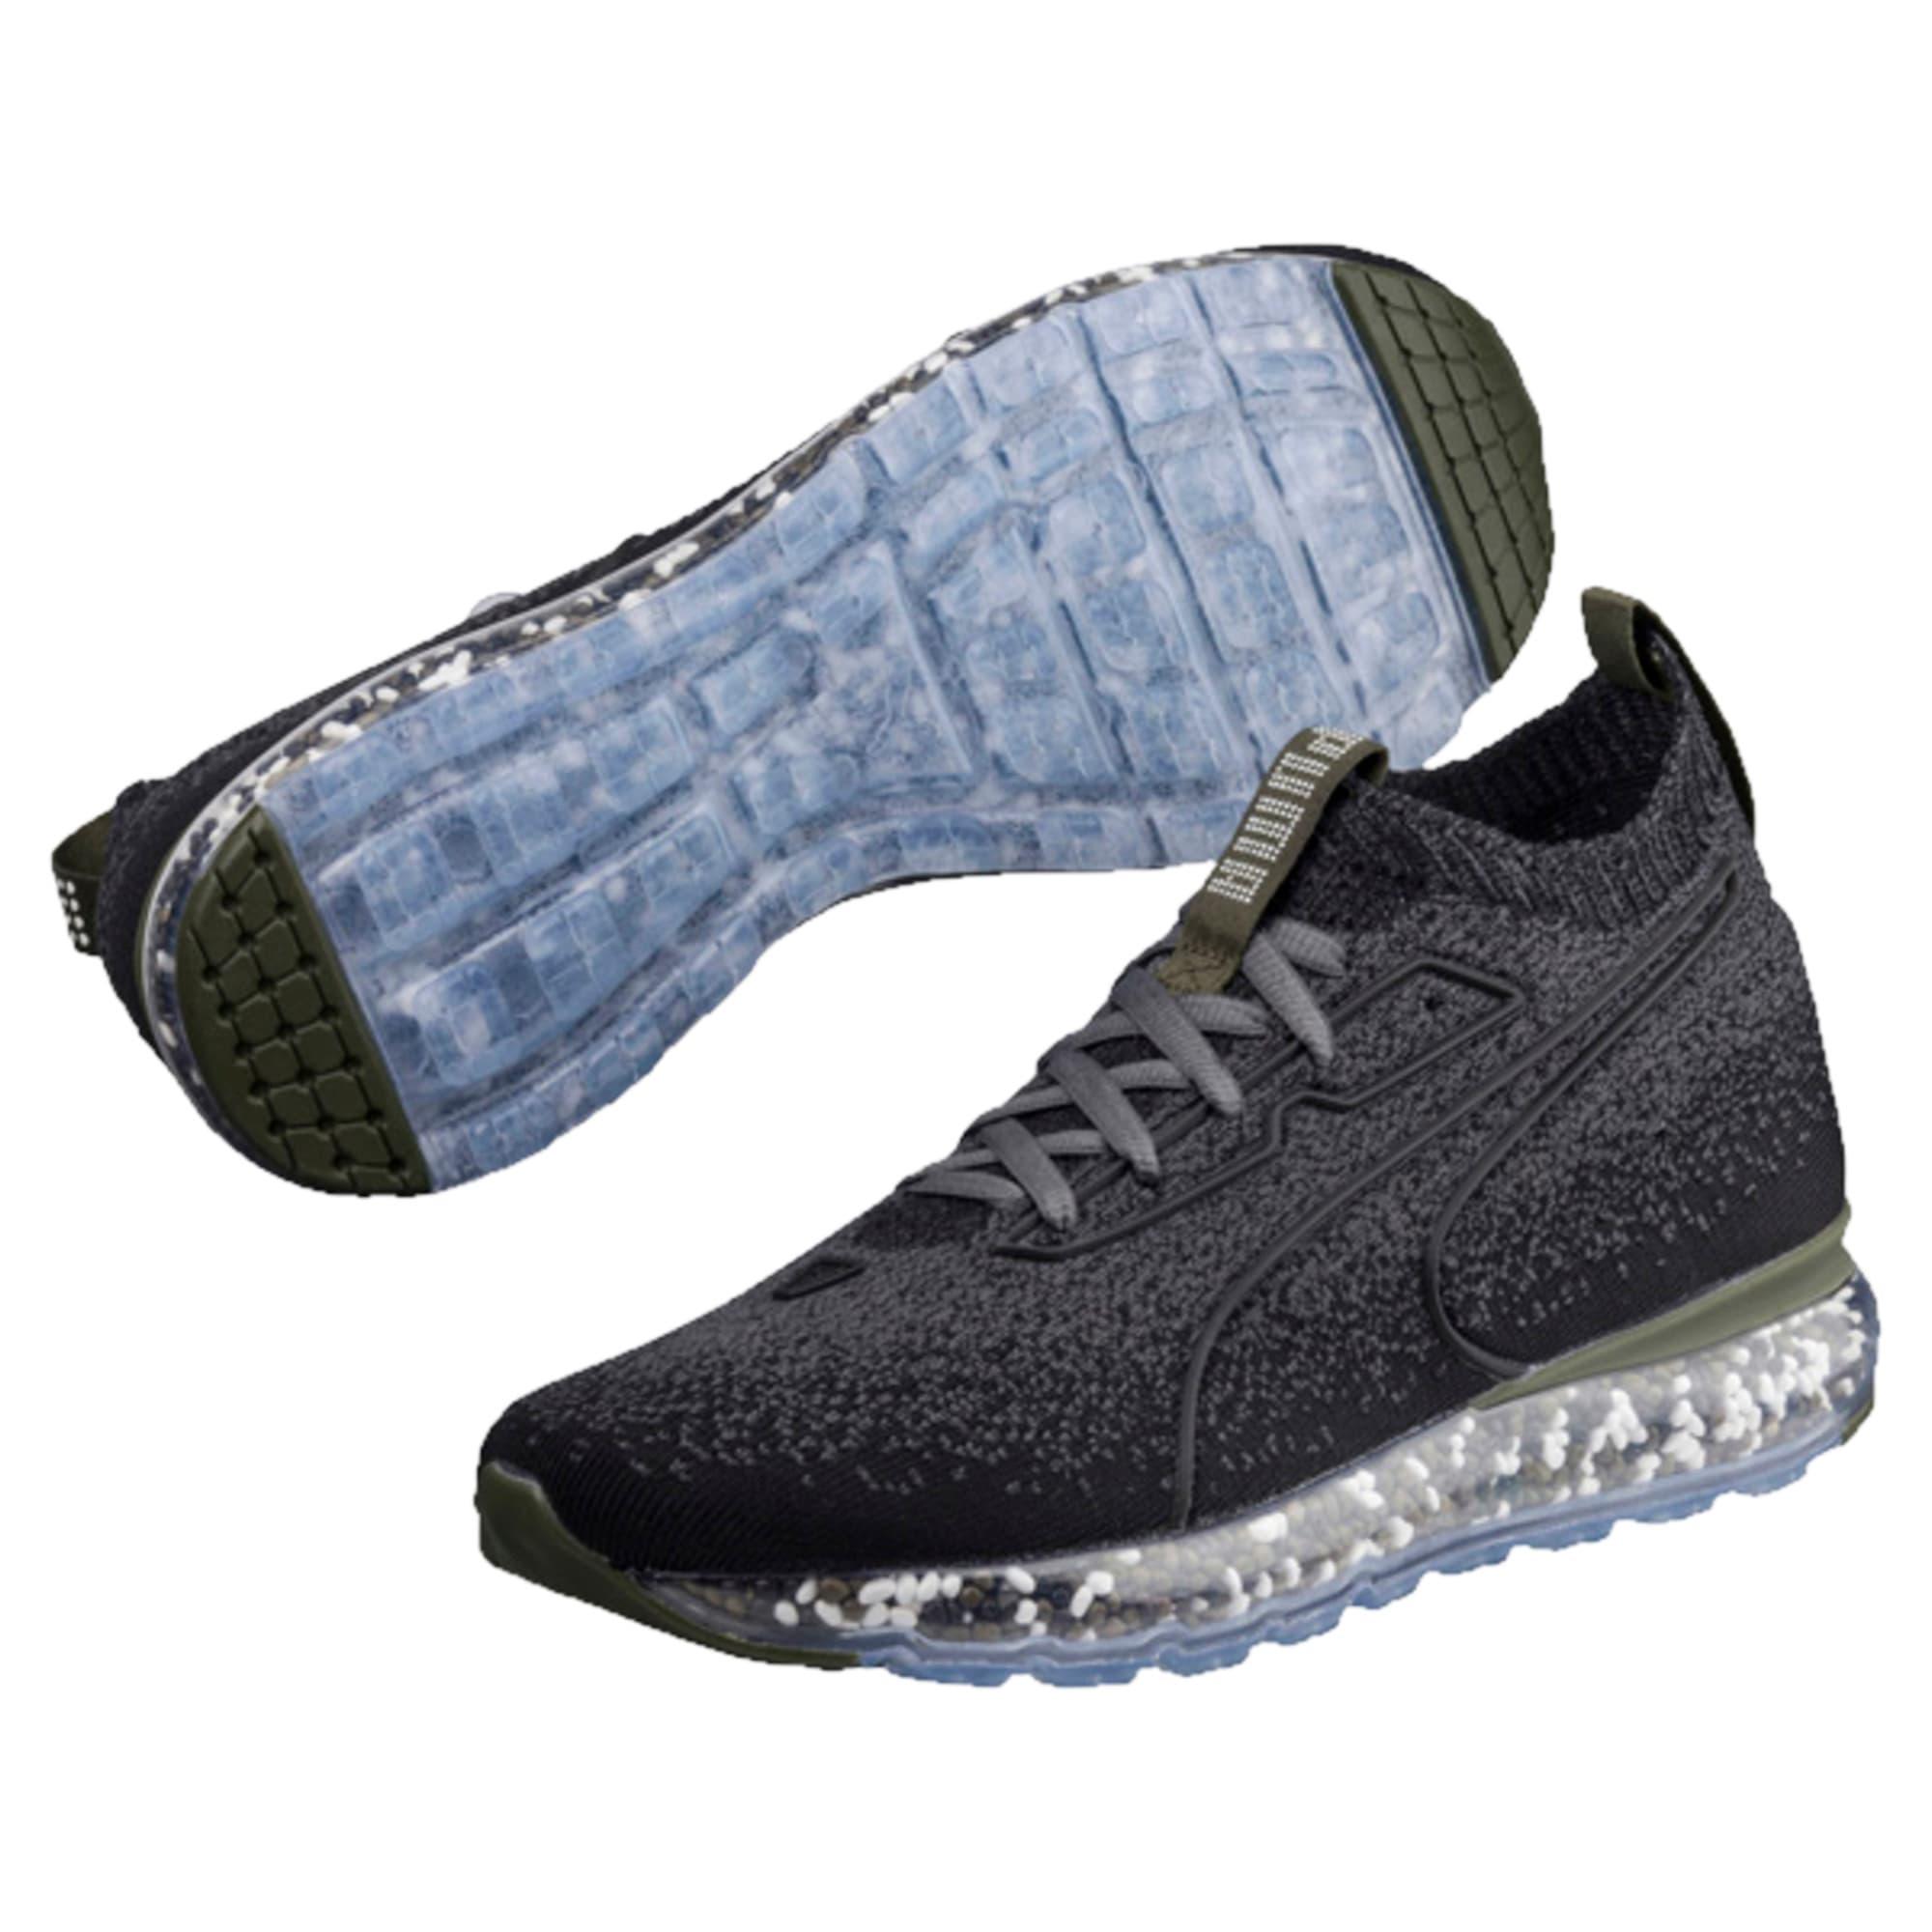 Thumbnail 1 of Jamming Women's Running Shoes, Puma Black-Forest Night, medium